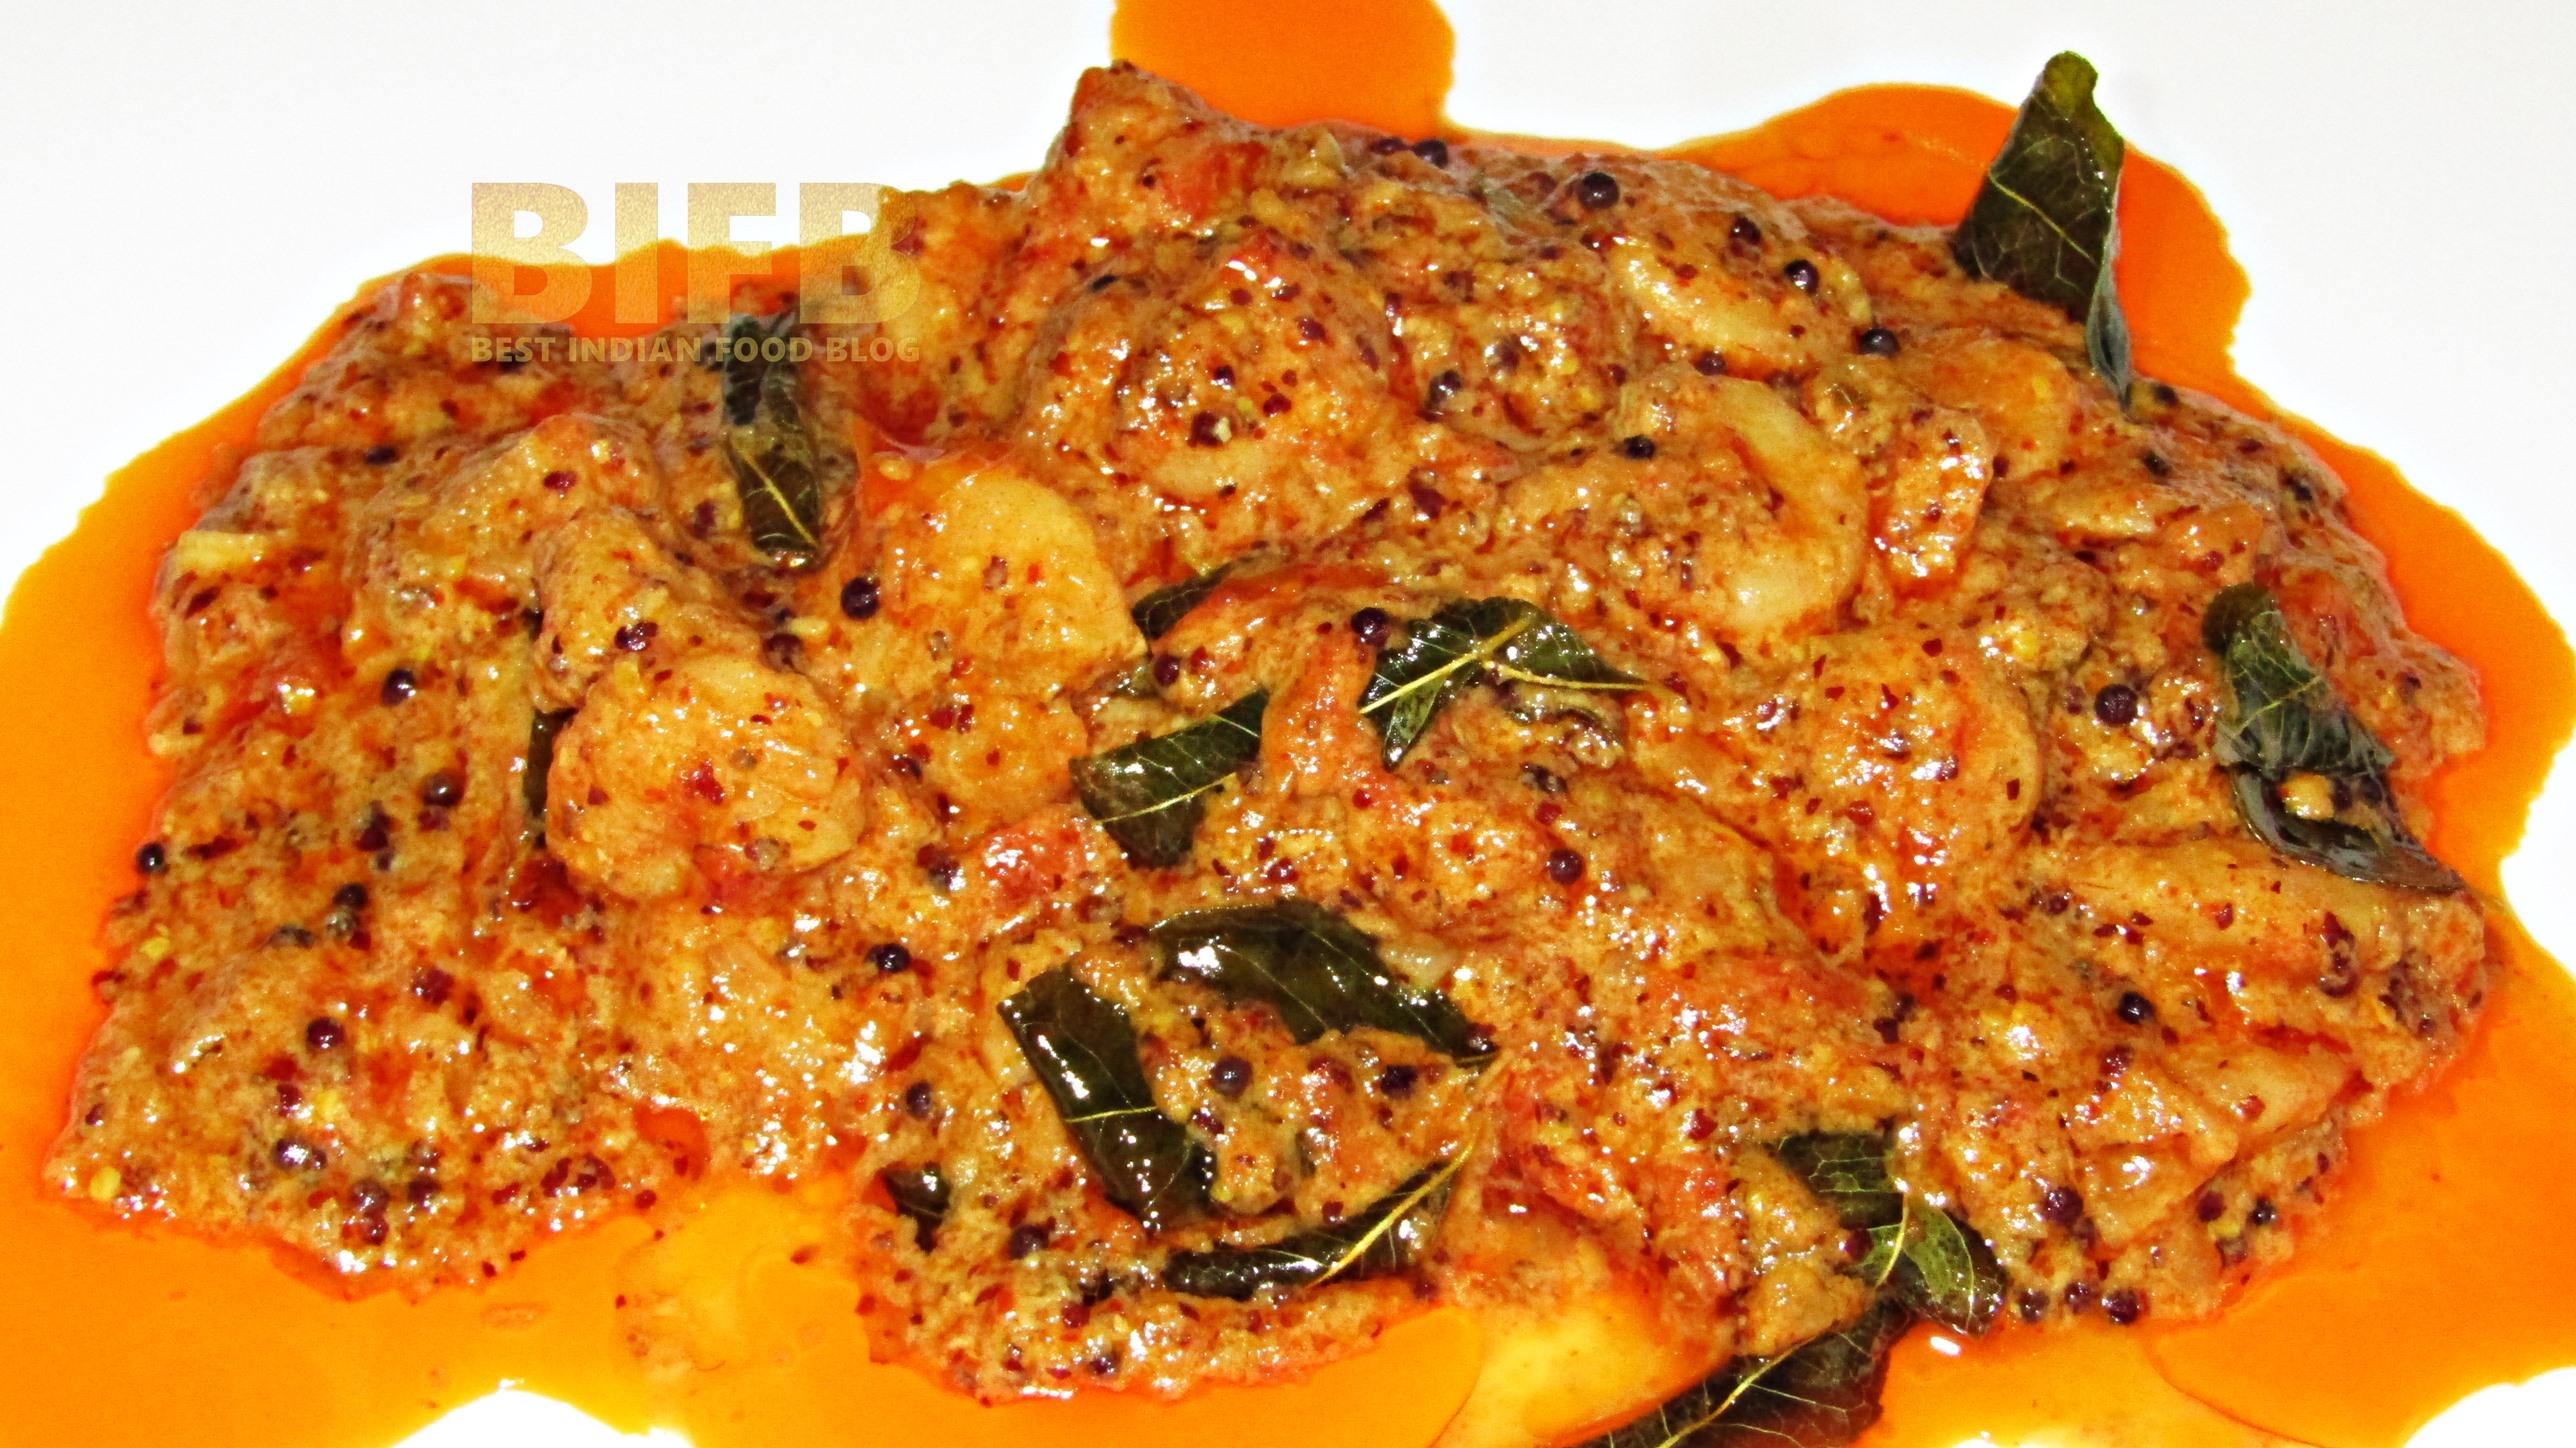 Kadugu Yerra from Puducherry, India | Best Indian Food Blog